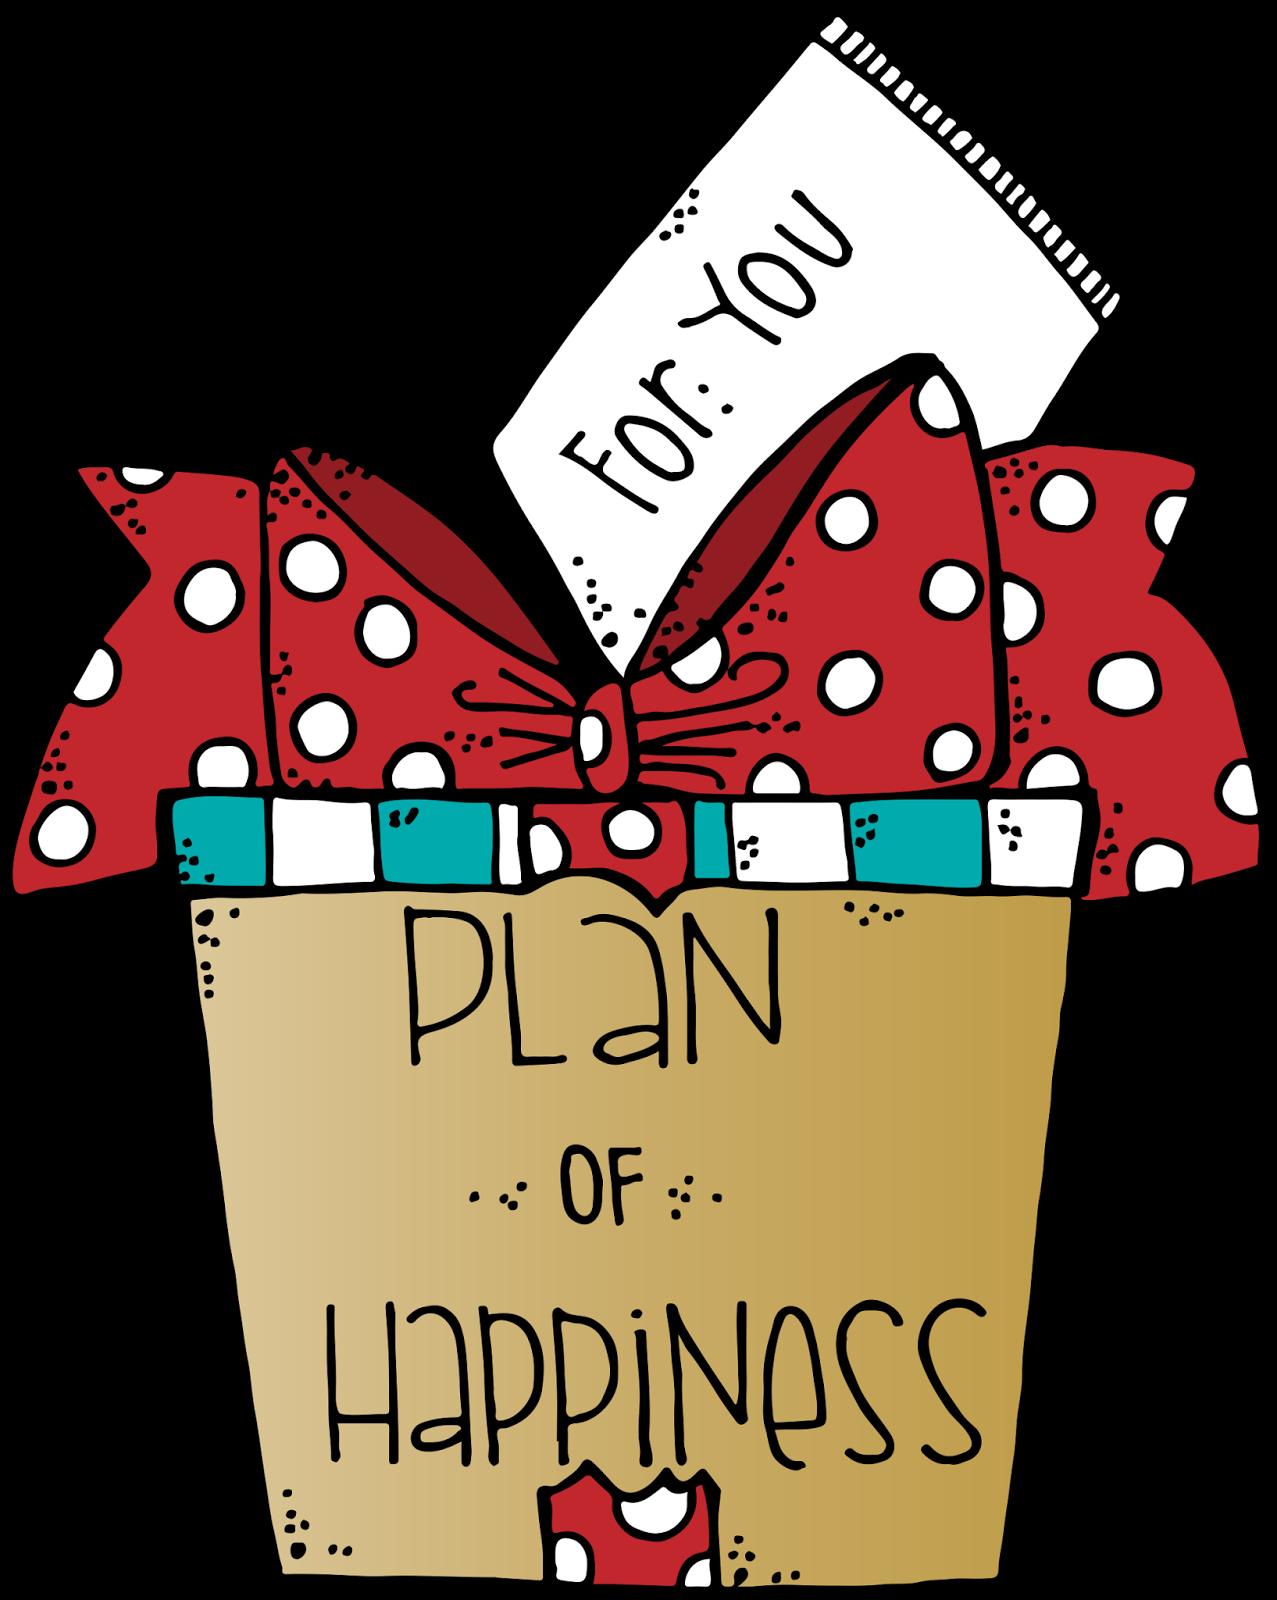 jpg transparent library Melonheadz clipart present. Plan od happiness mhldsf.